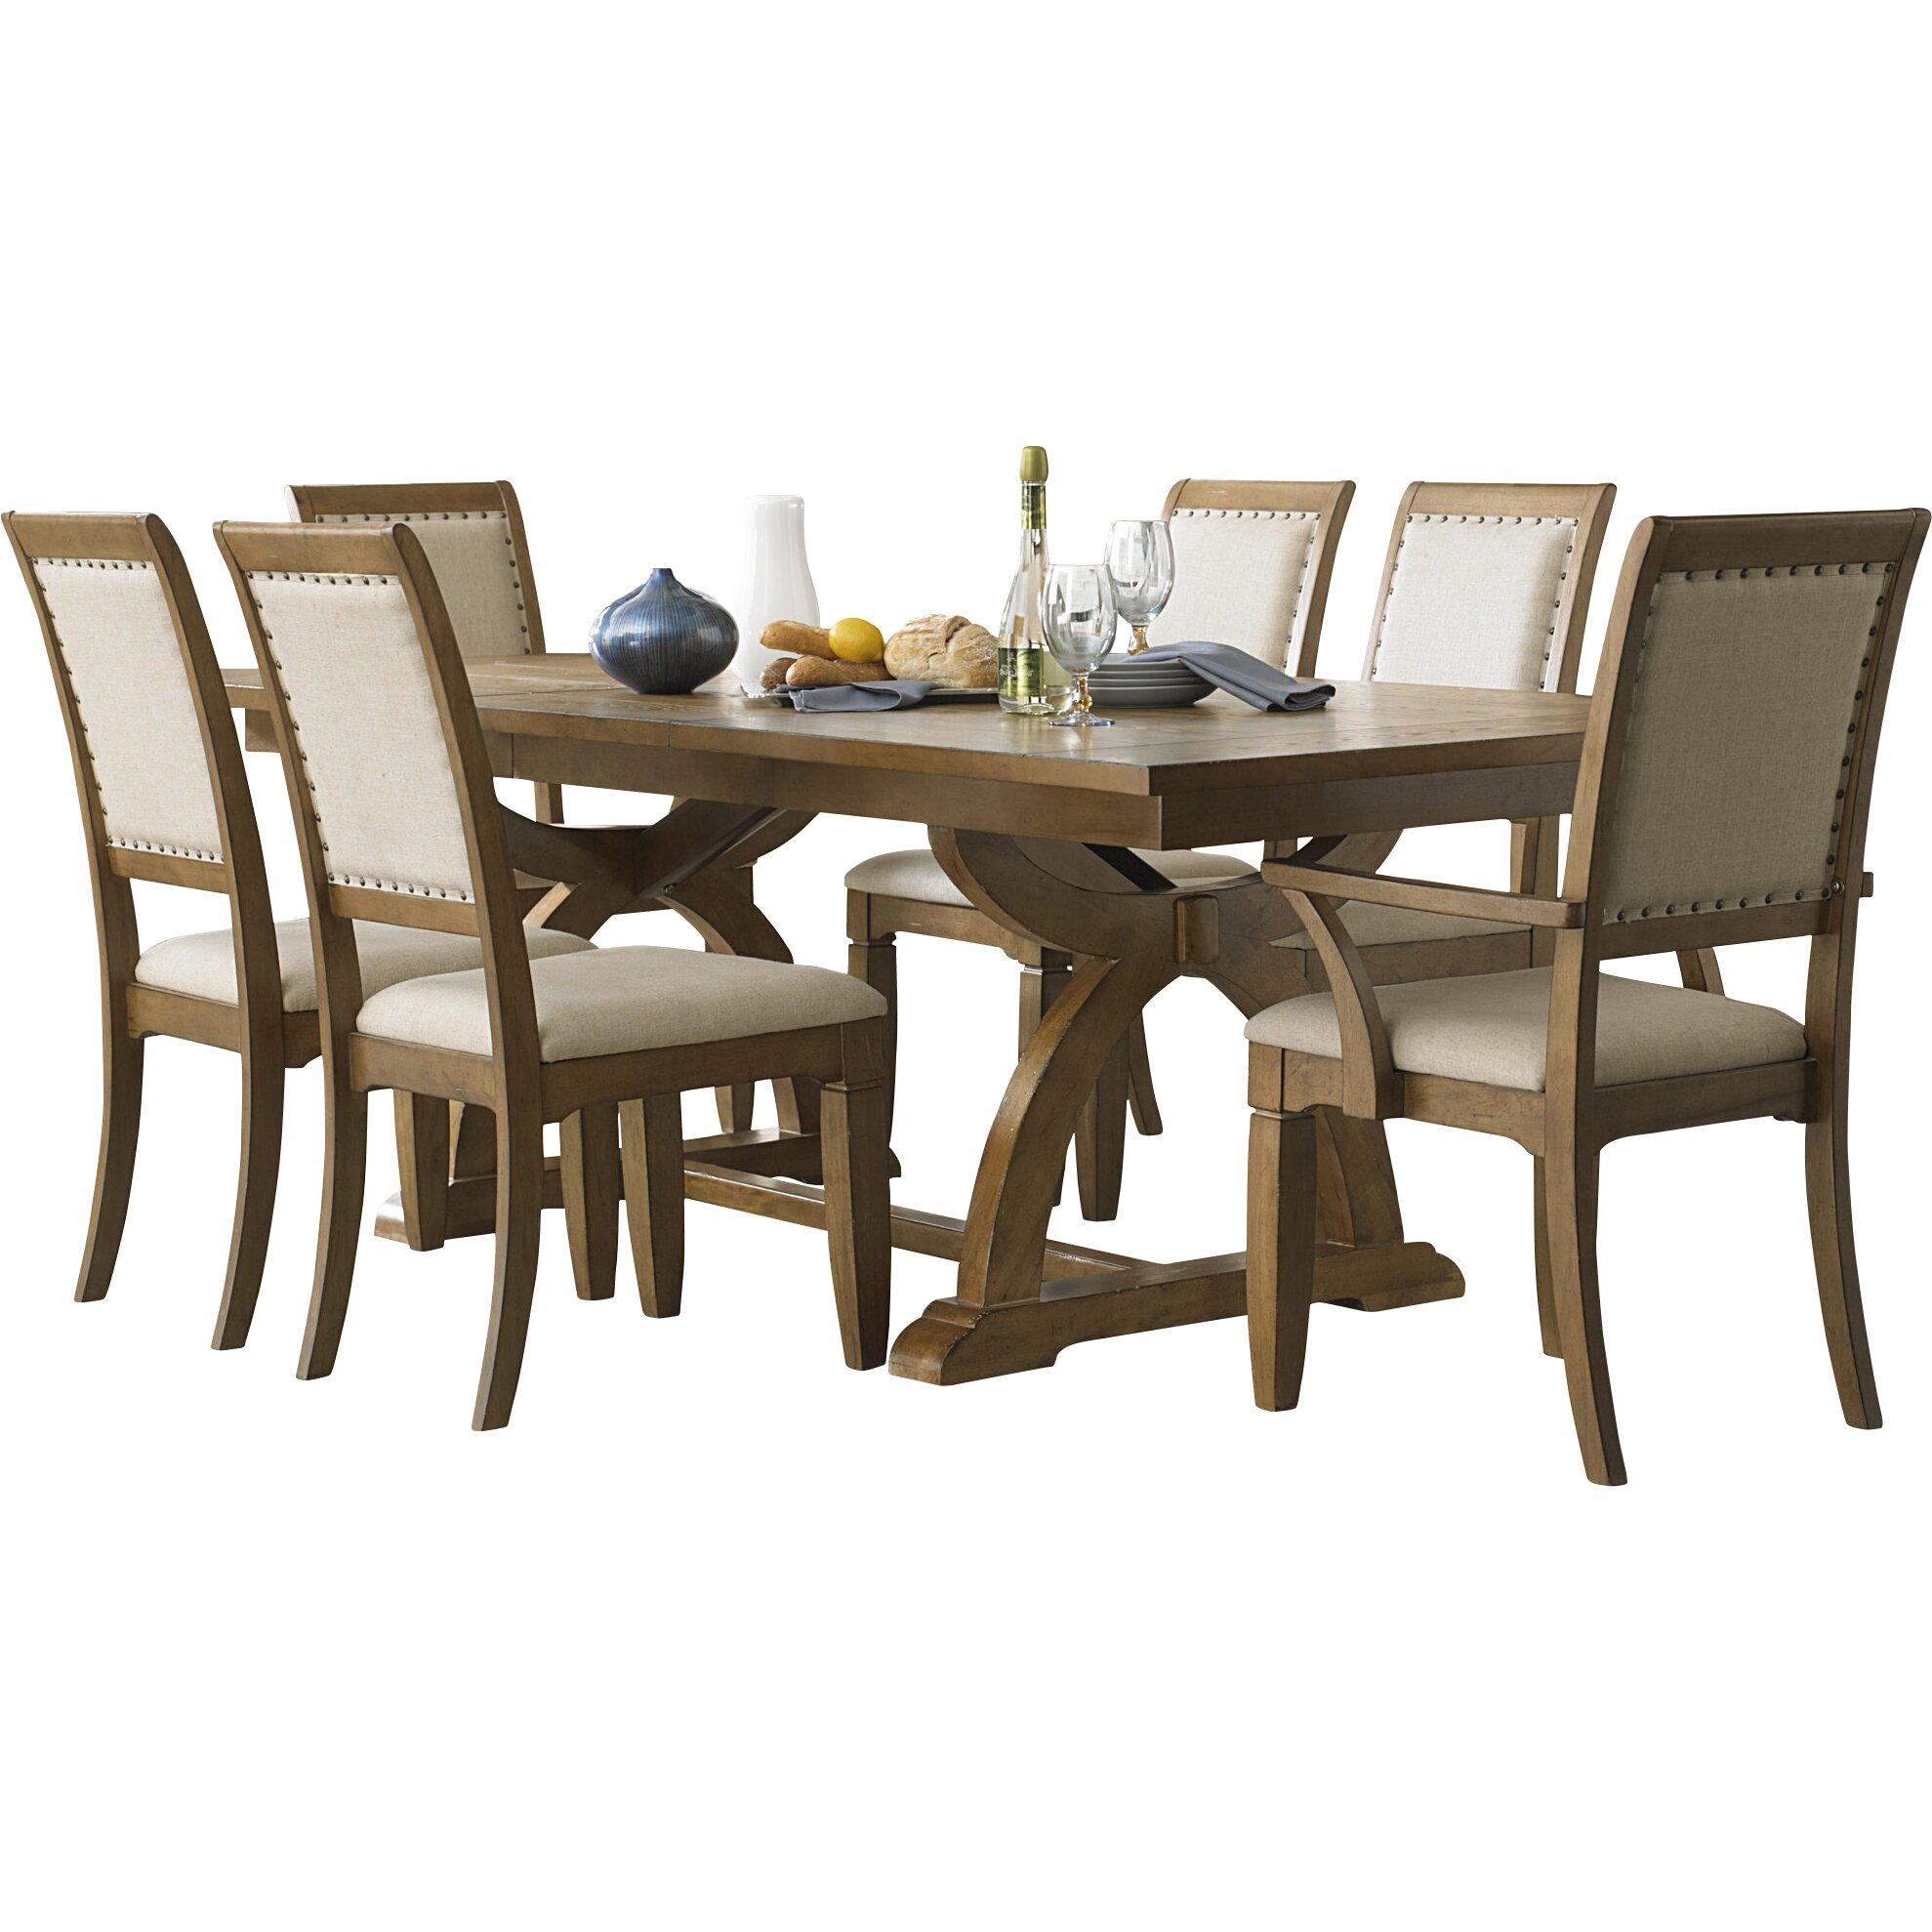 Lark manor ema 6 piece dining set reviews wayfair for Dining room sets 6 piece